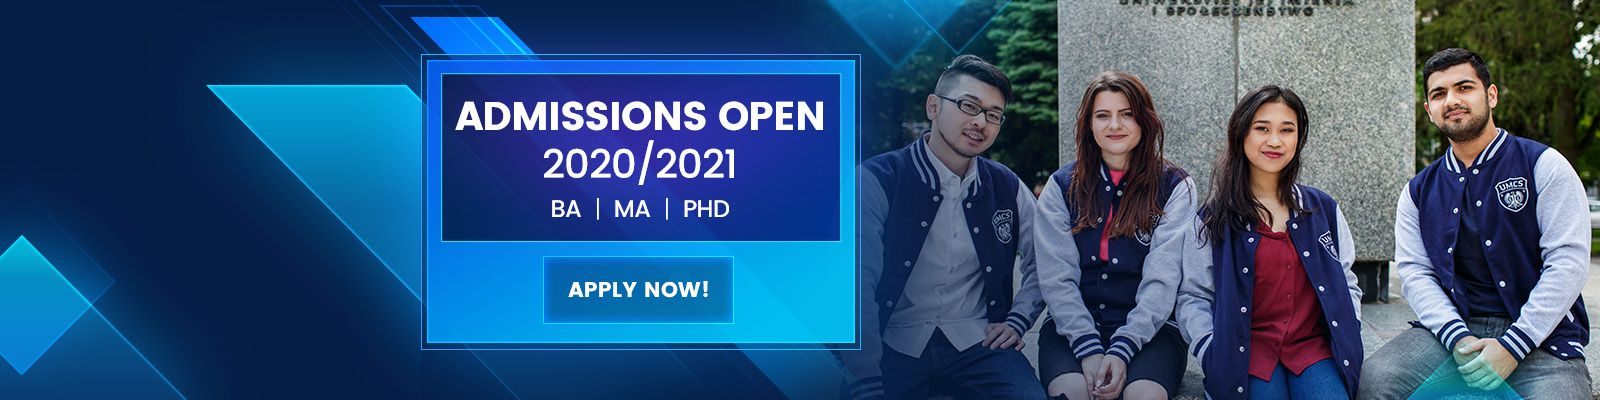 Admissions 2020/2021